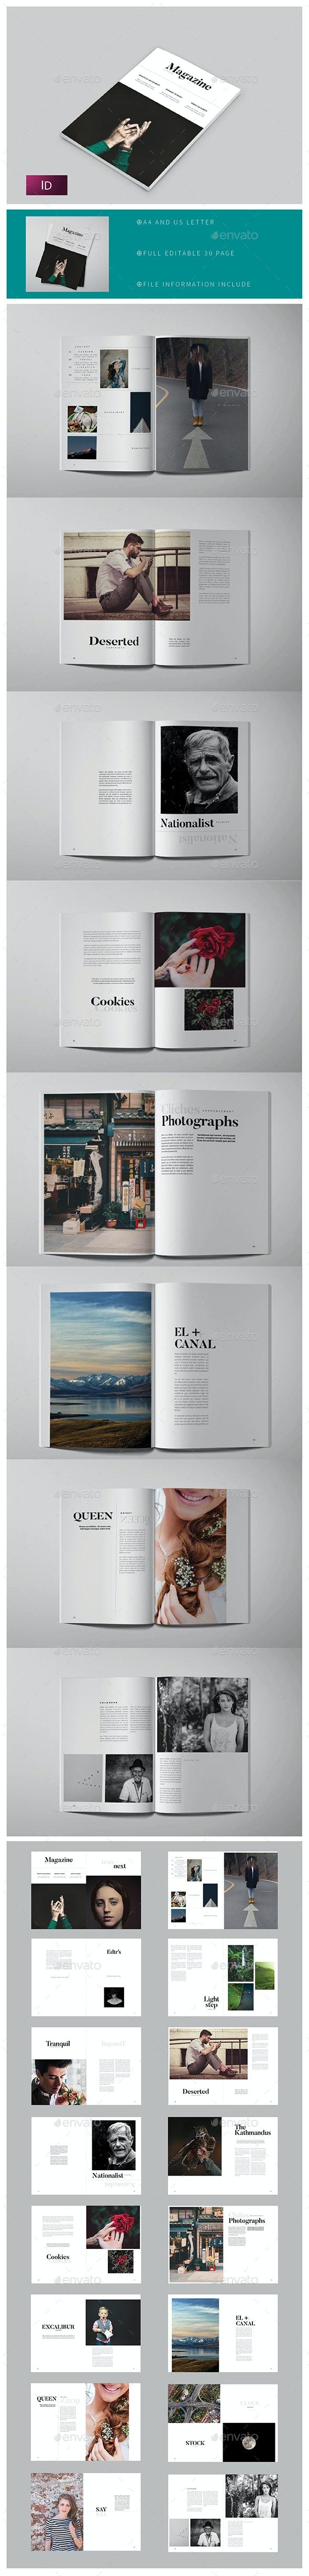 Magazine Template - Magazines Print Templates